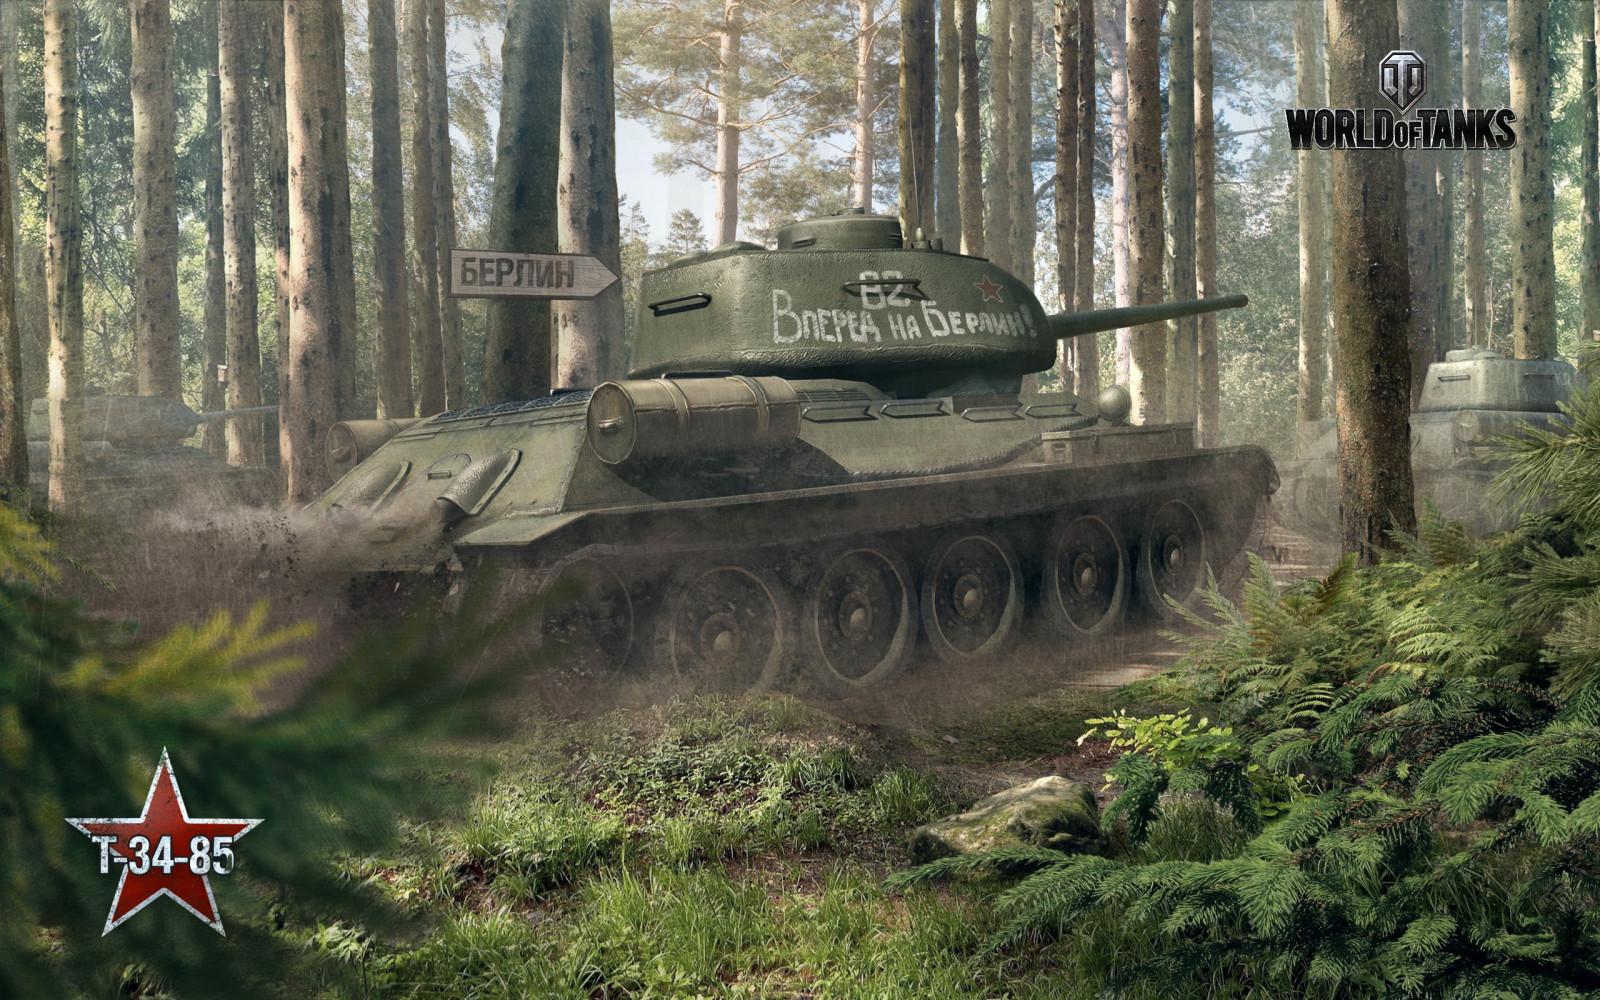 T-34-85 soviet medium tank during the great patriotic war museum liberty park the netherlands